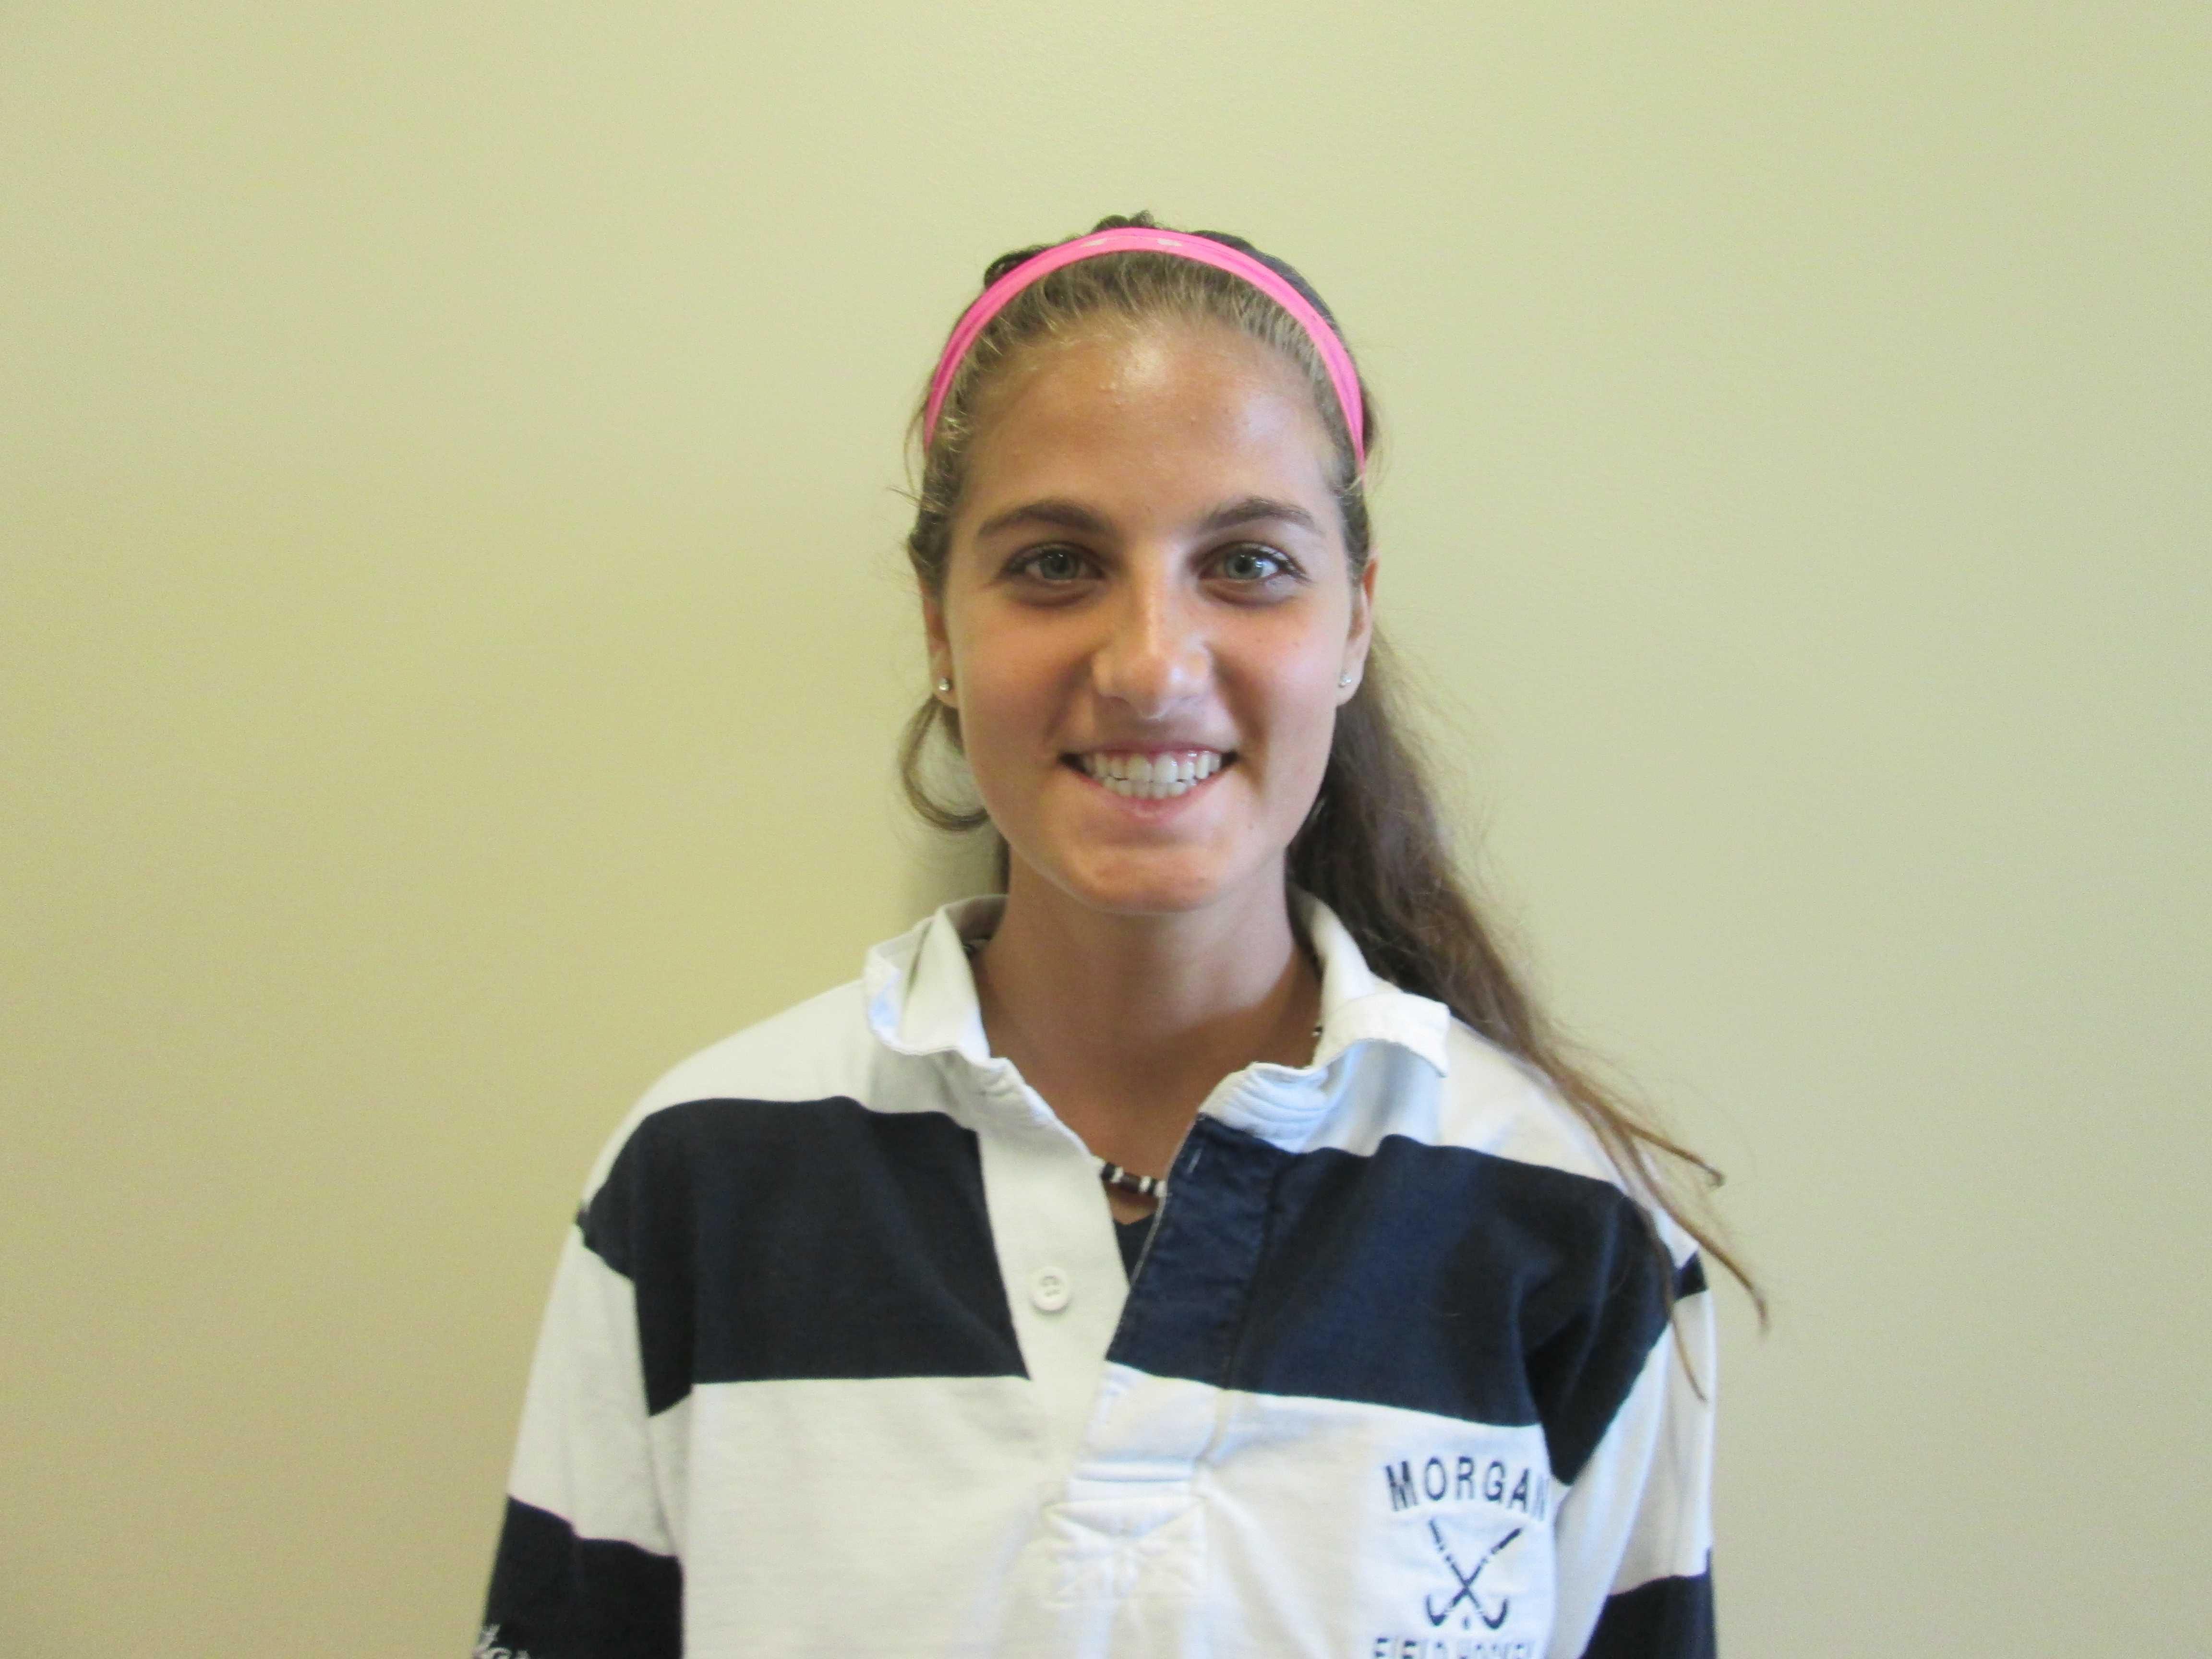 Abby Pitarra